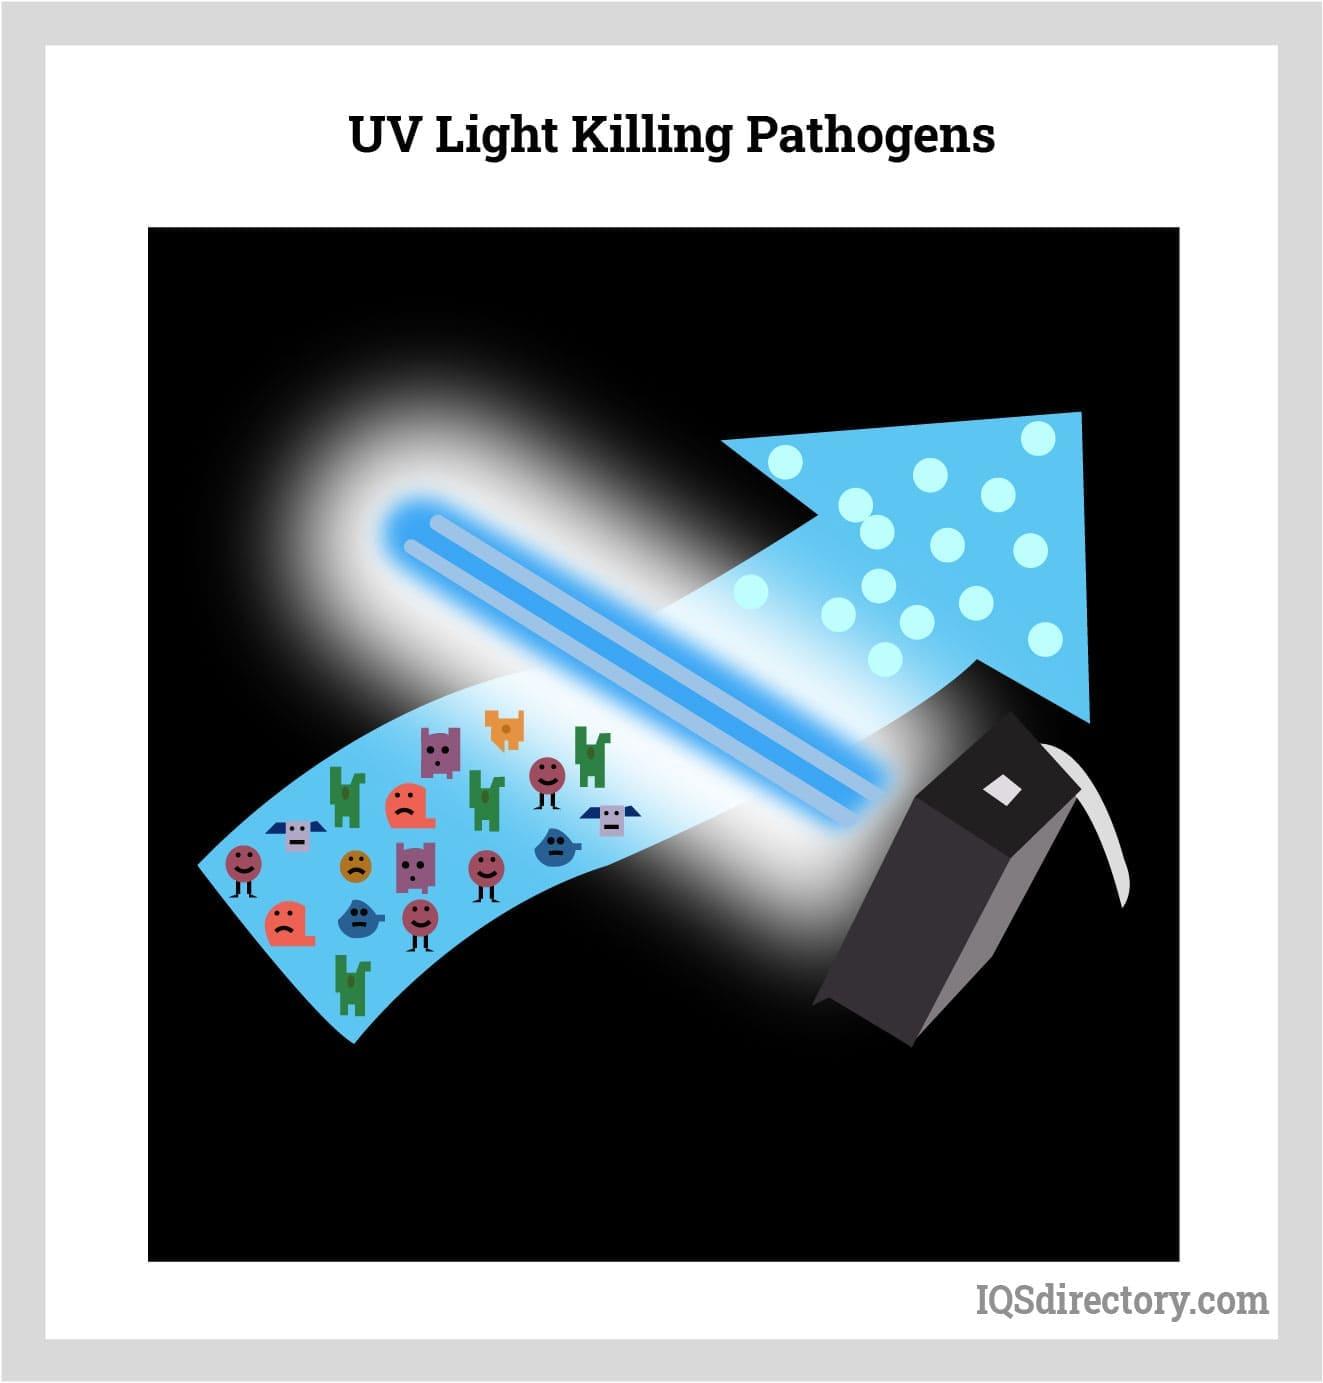 UV Light Killing Pathogens